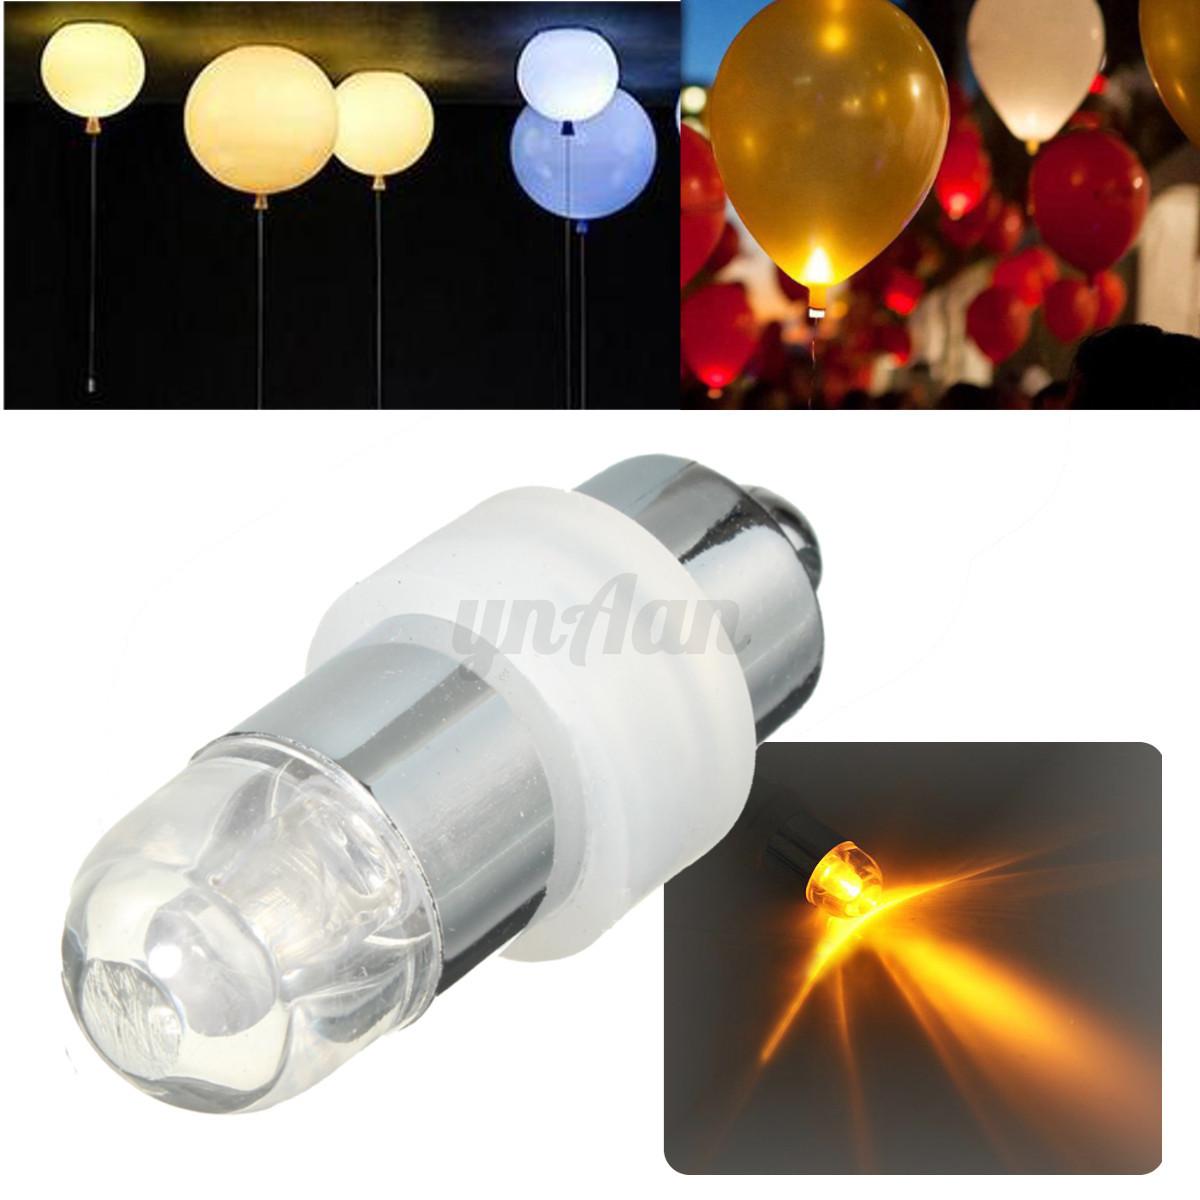 Waterproof Flashing LED Balloon Lantern Light Lamp Wedding Birthday Party Decor